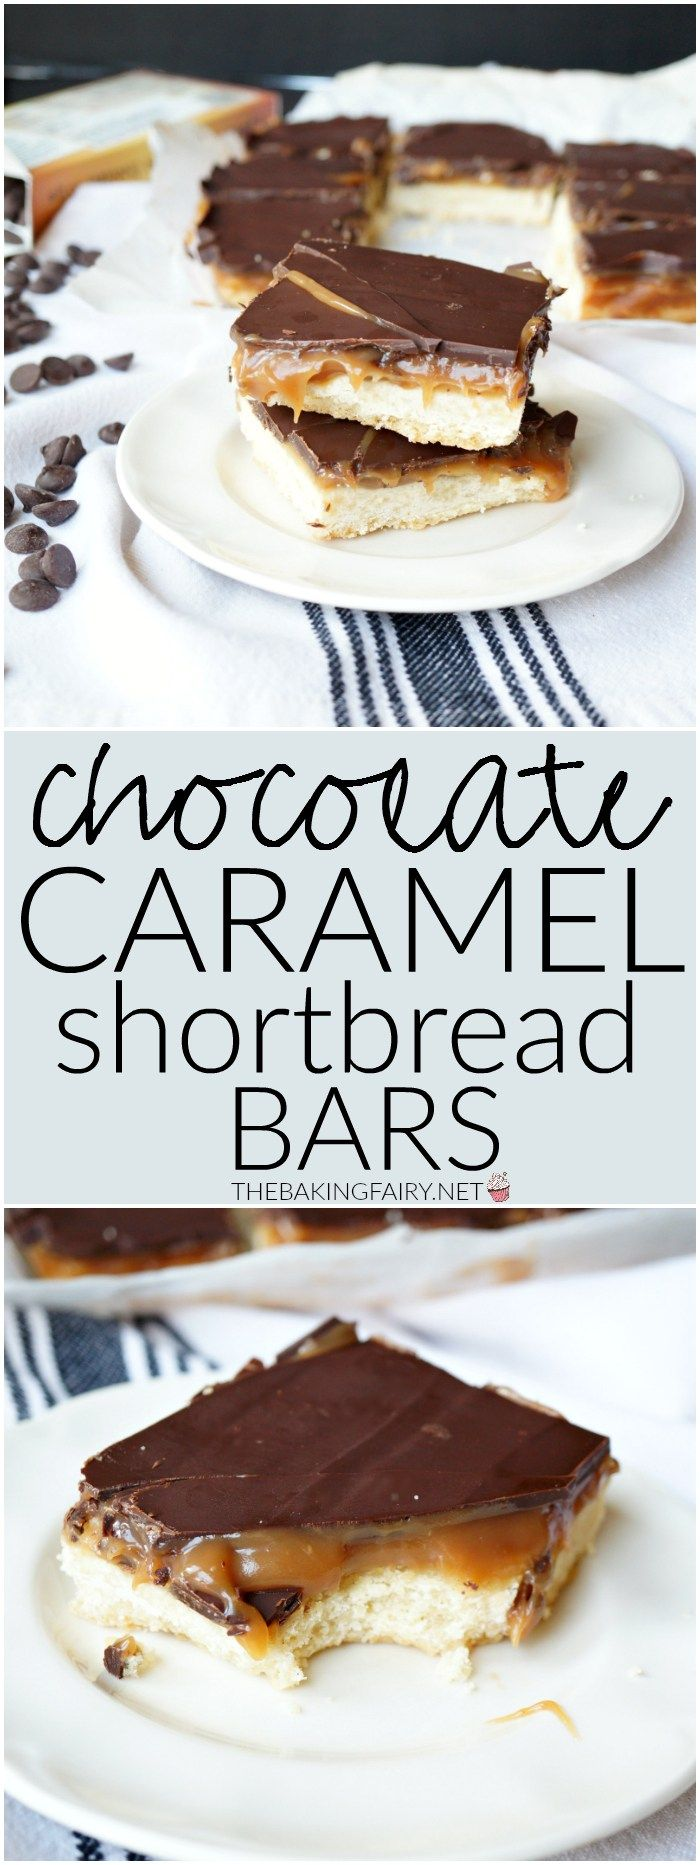 chocolate caramel shortbread bars | The Baking Fairy